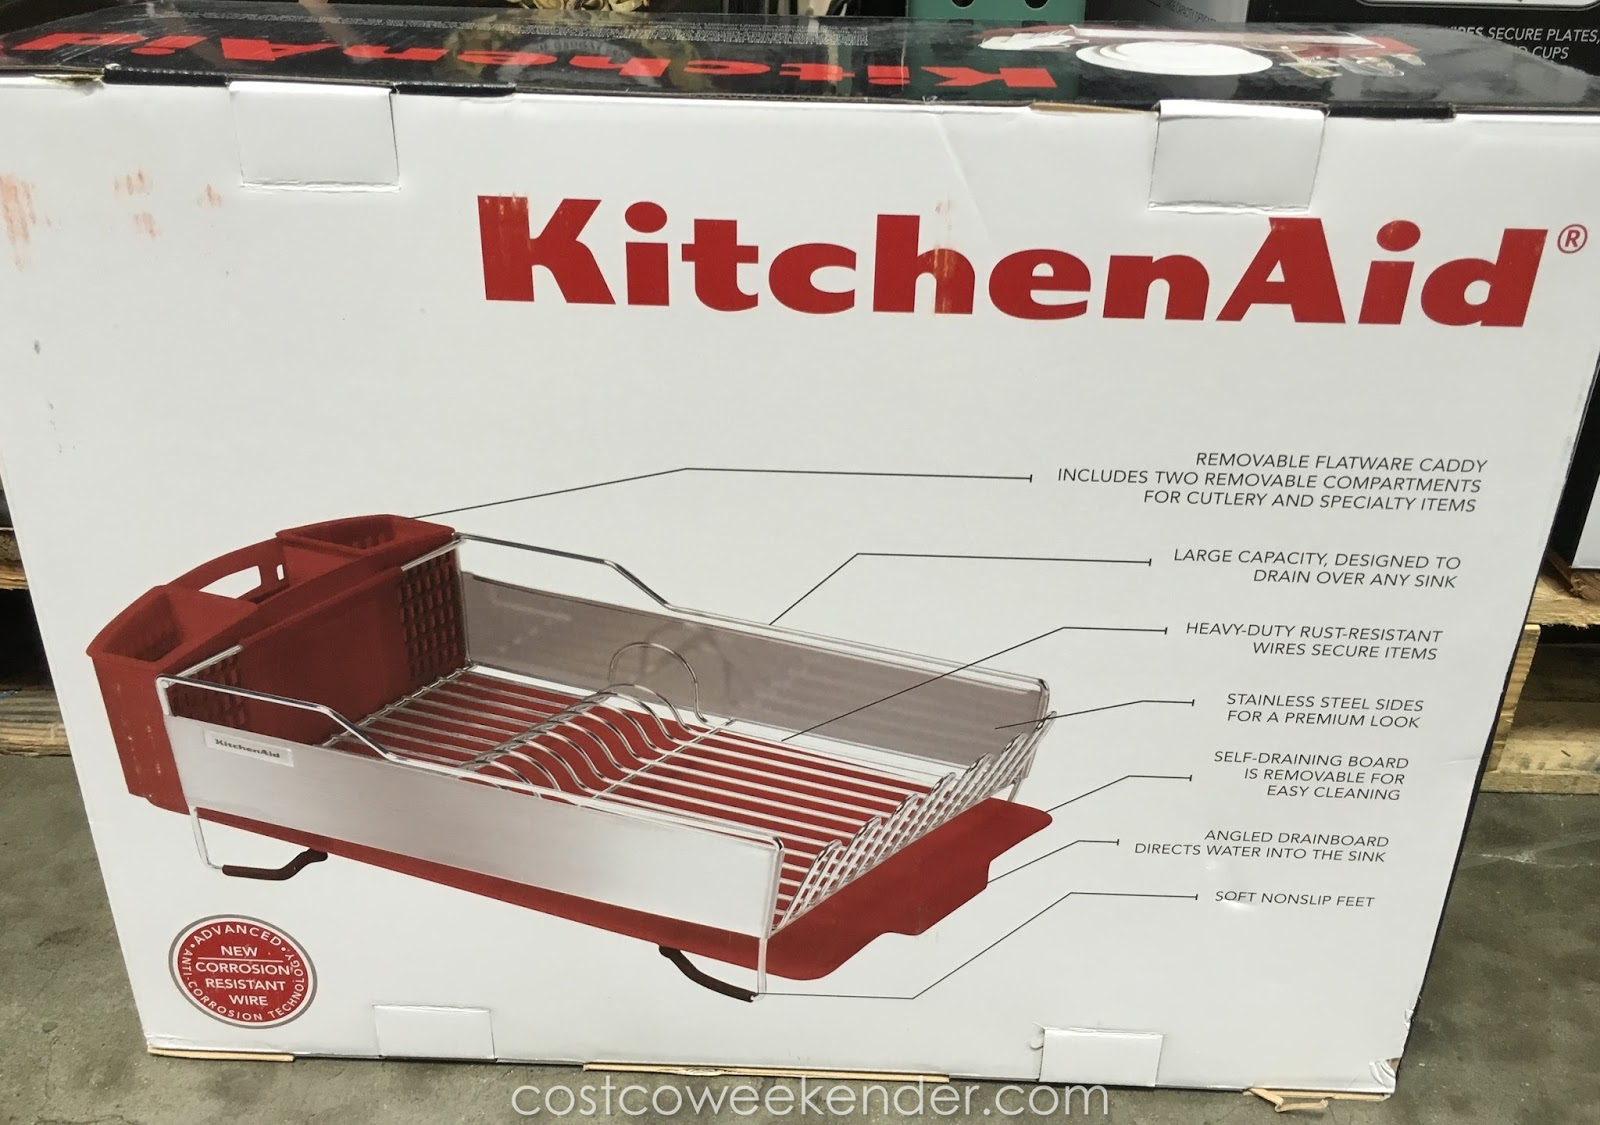 kitchenaid stainless steel dish drying rack costco weekender. Black Bedroom Furniture Sets. Home Design Ideas